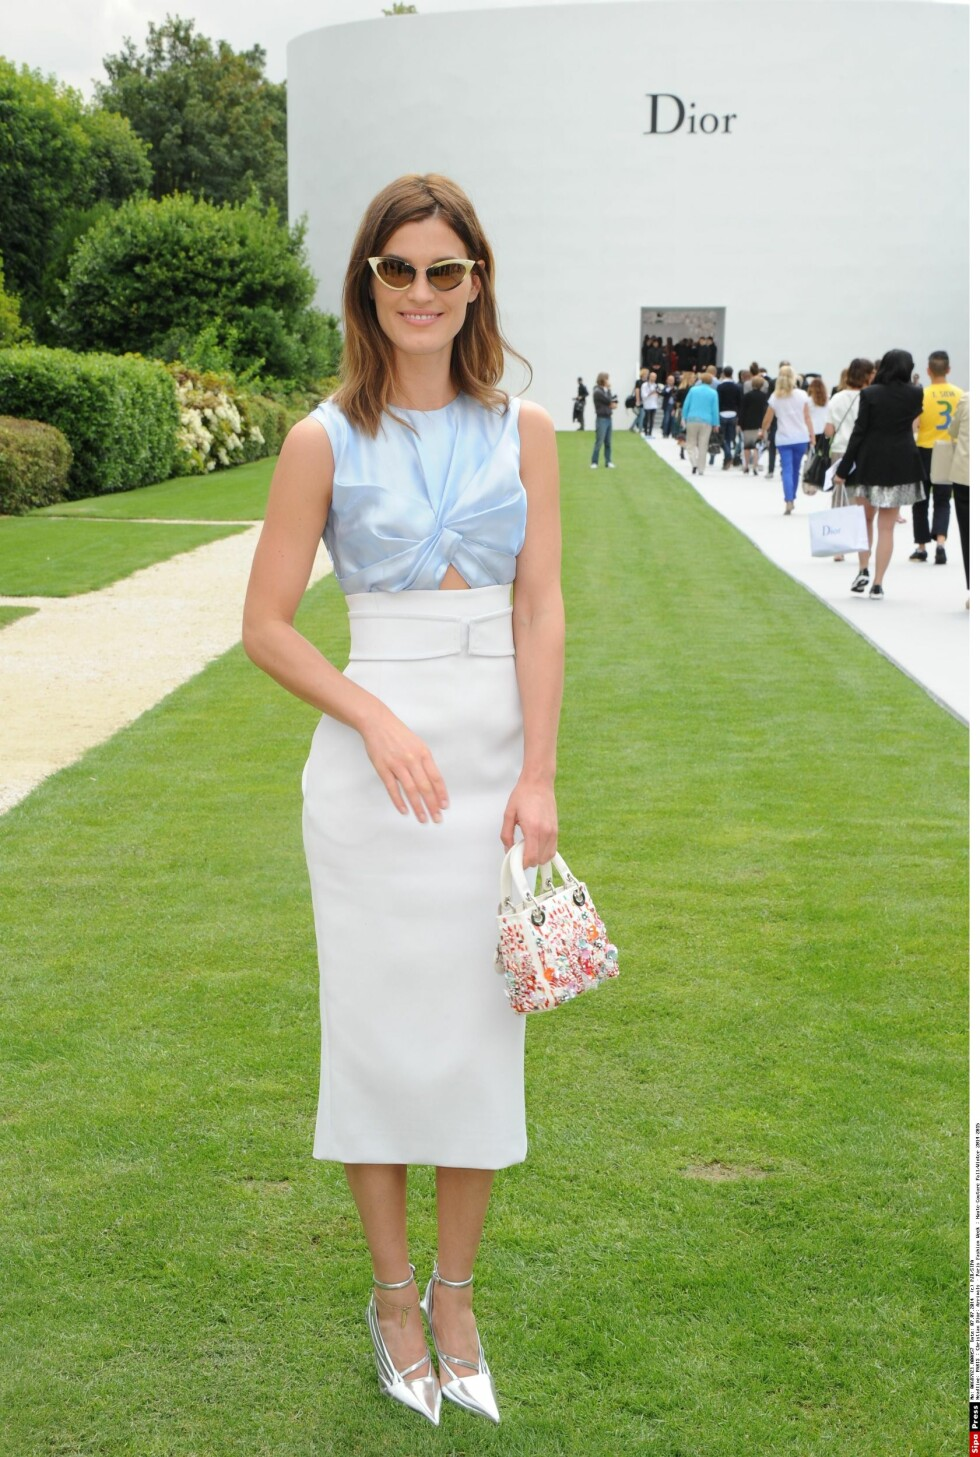 I GODT HUMØR: Bloggeren og modellen Hanneli Mustaparta var i godt humør da hun ankom Dior-visningen. Foto: PJB/SIPA/All Over Press